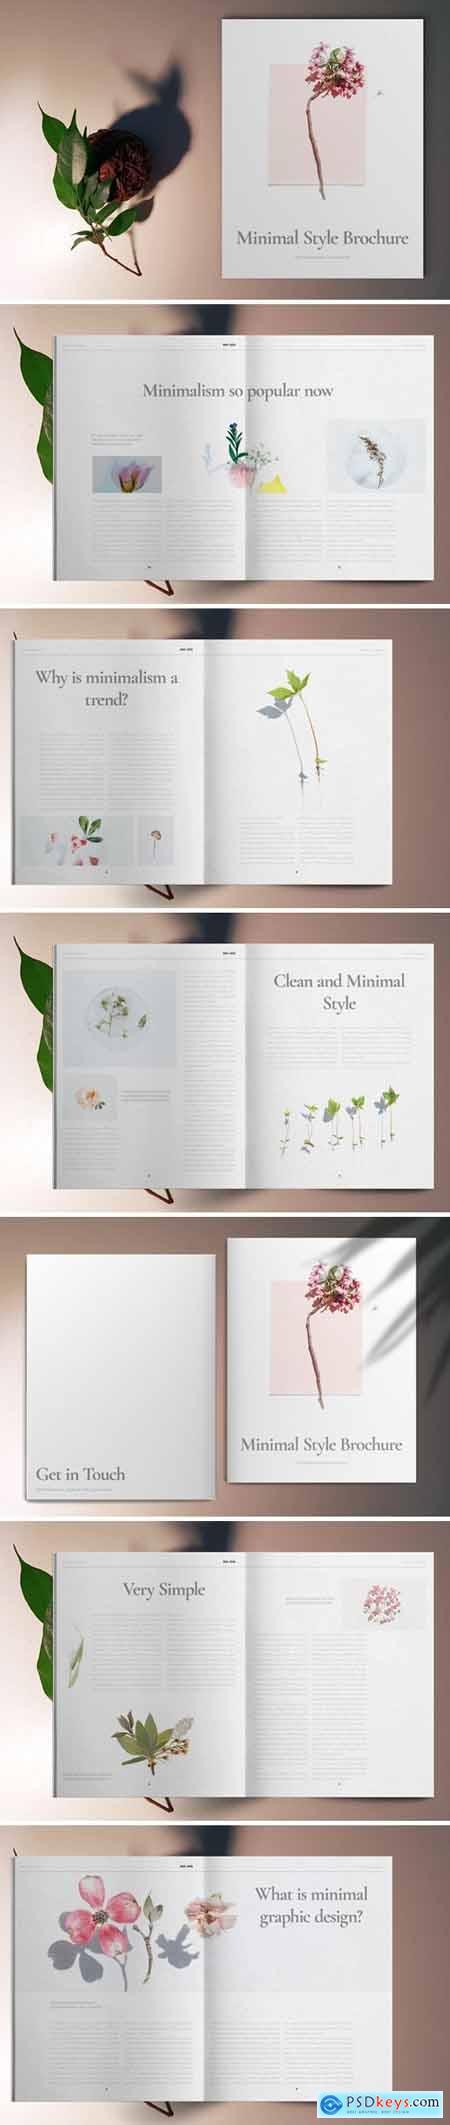 Minimal Brochure Template 5667398